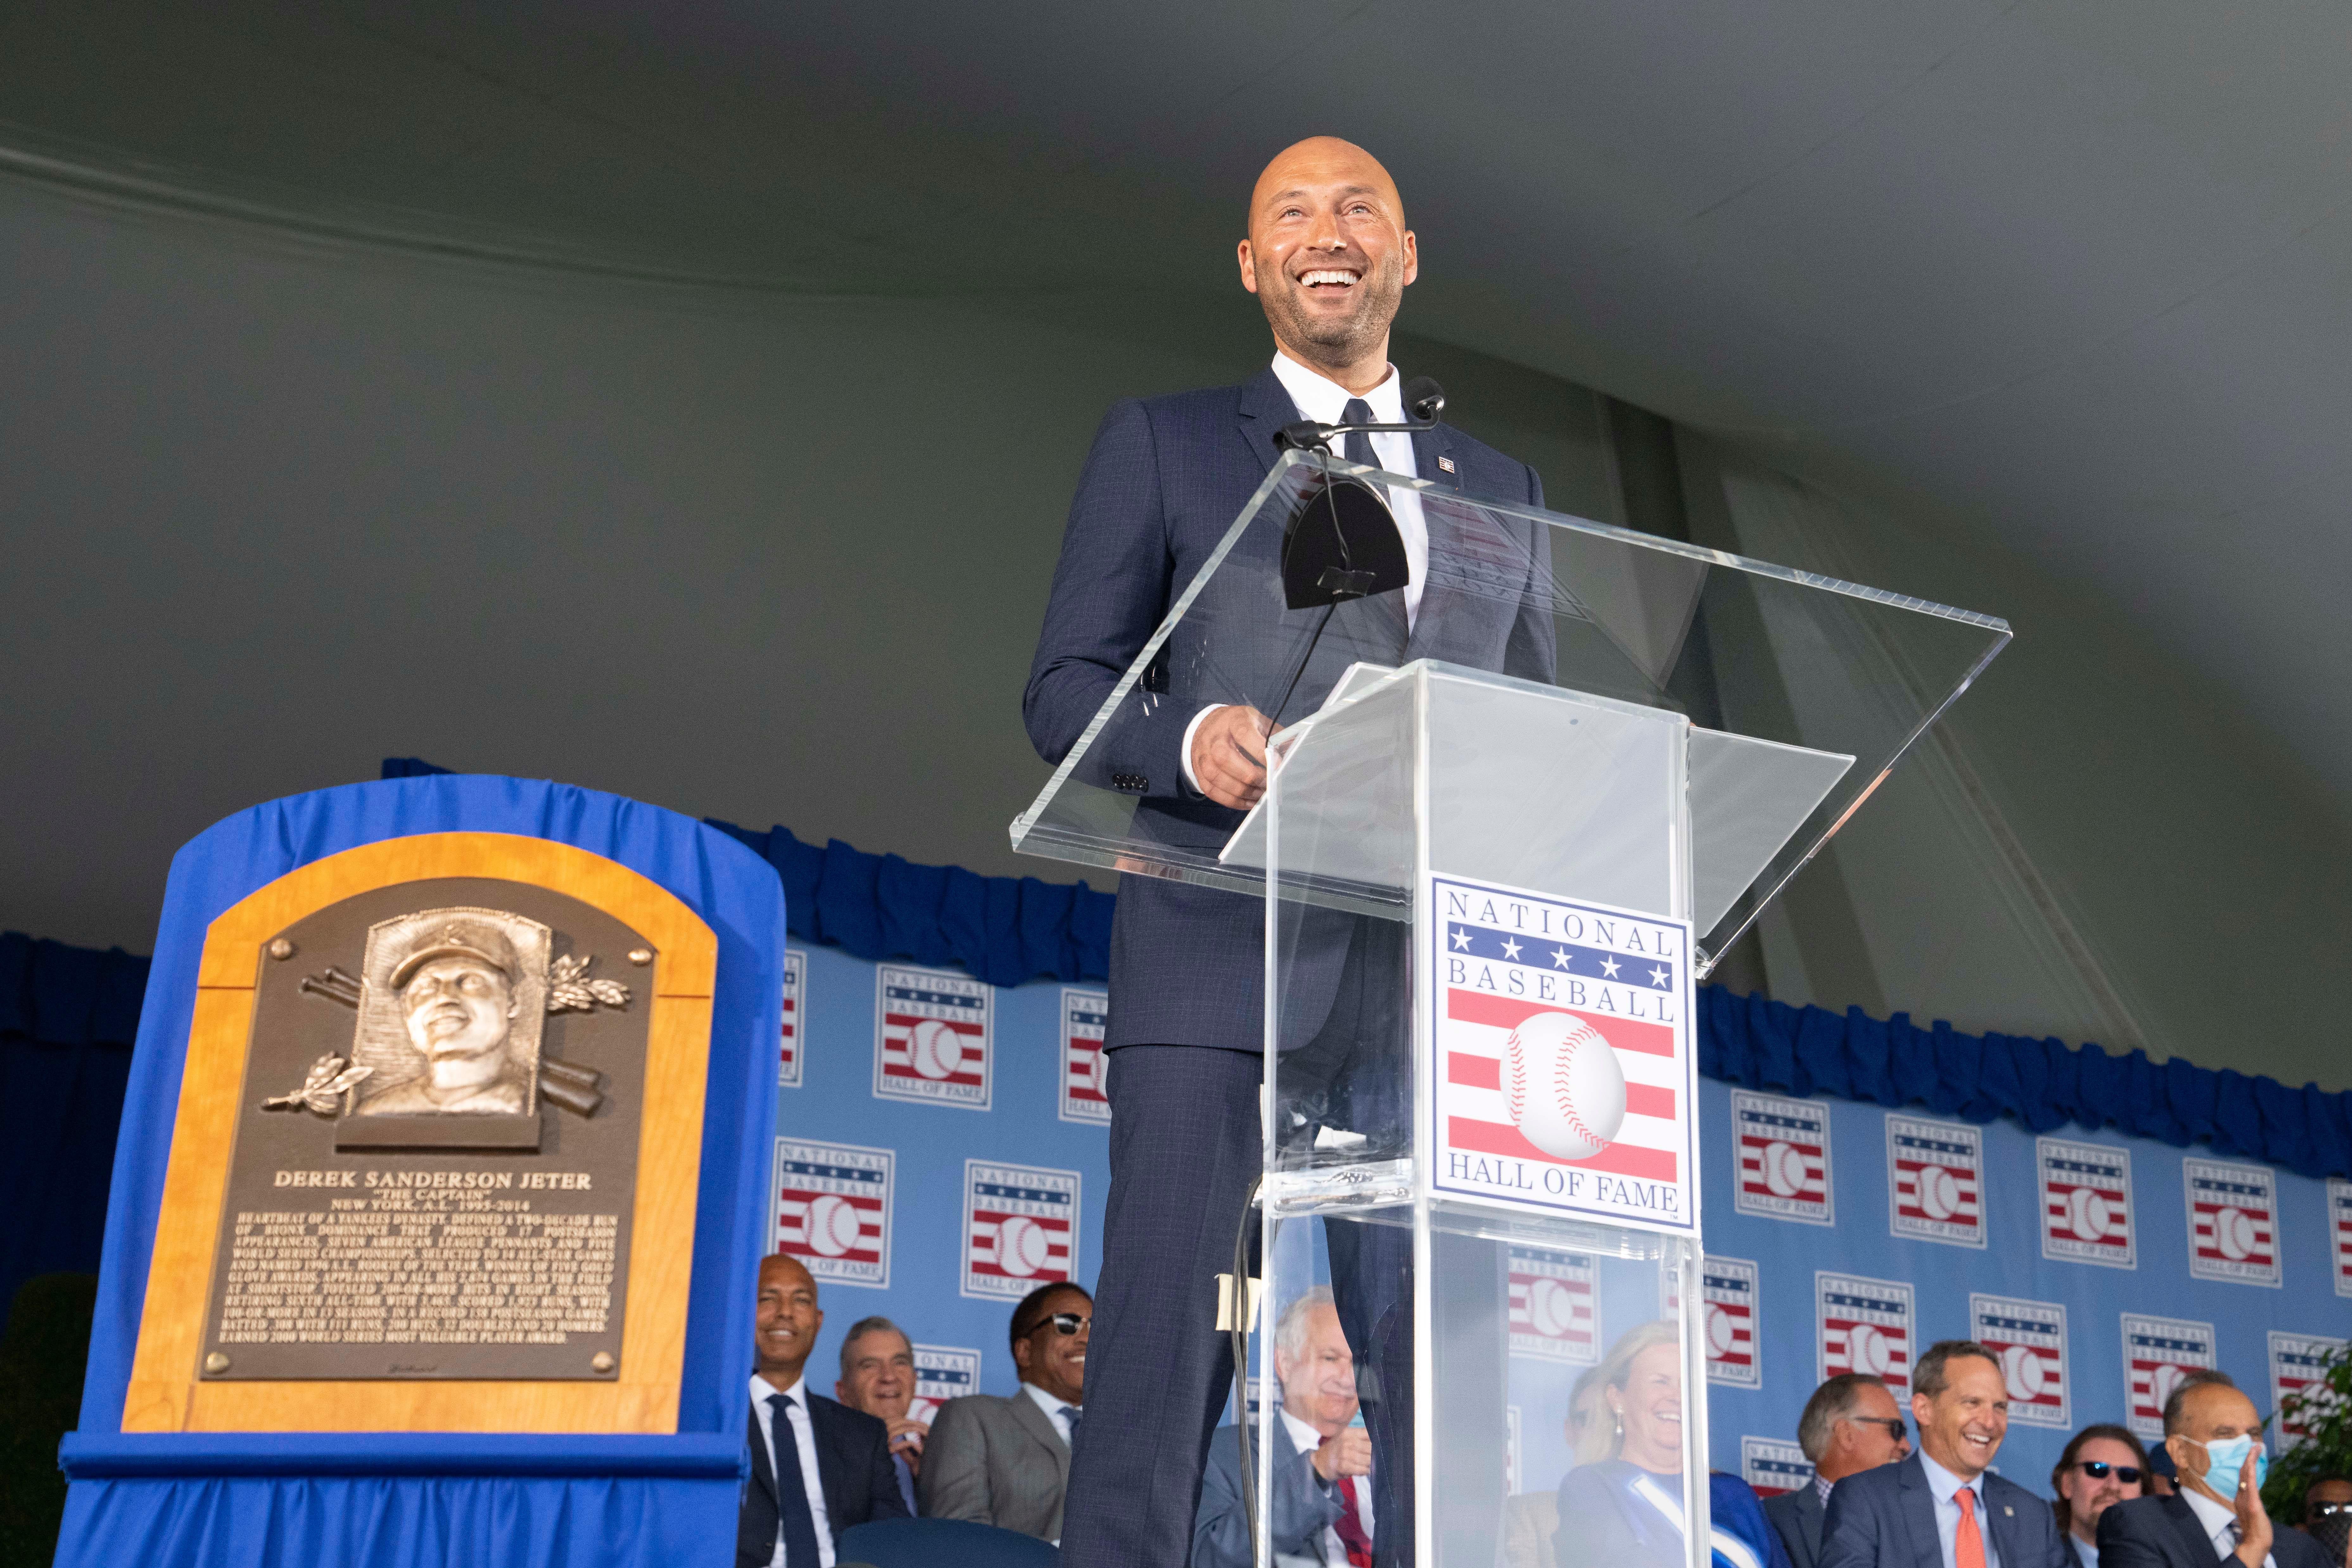 Derek Jeter smiles at a podium alongside his Baseball Hall of Fame plaque.